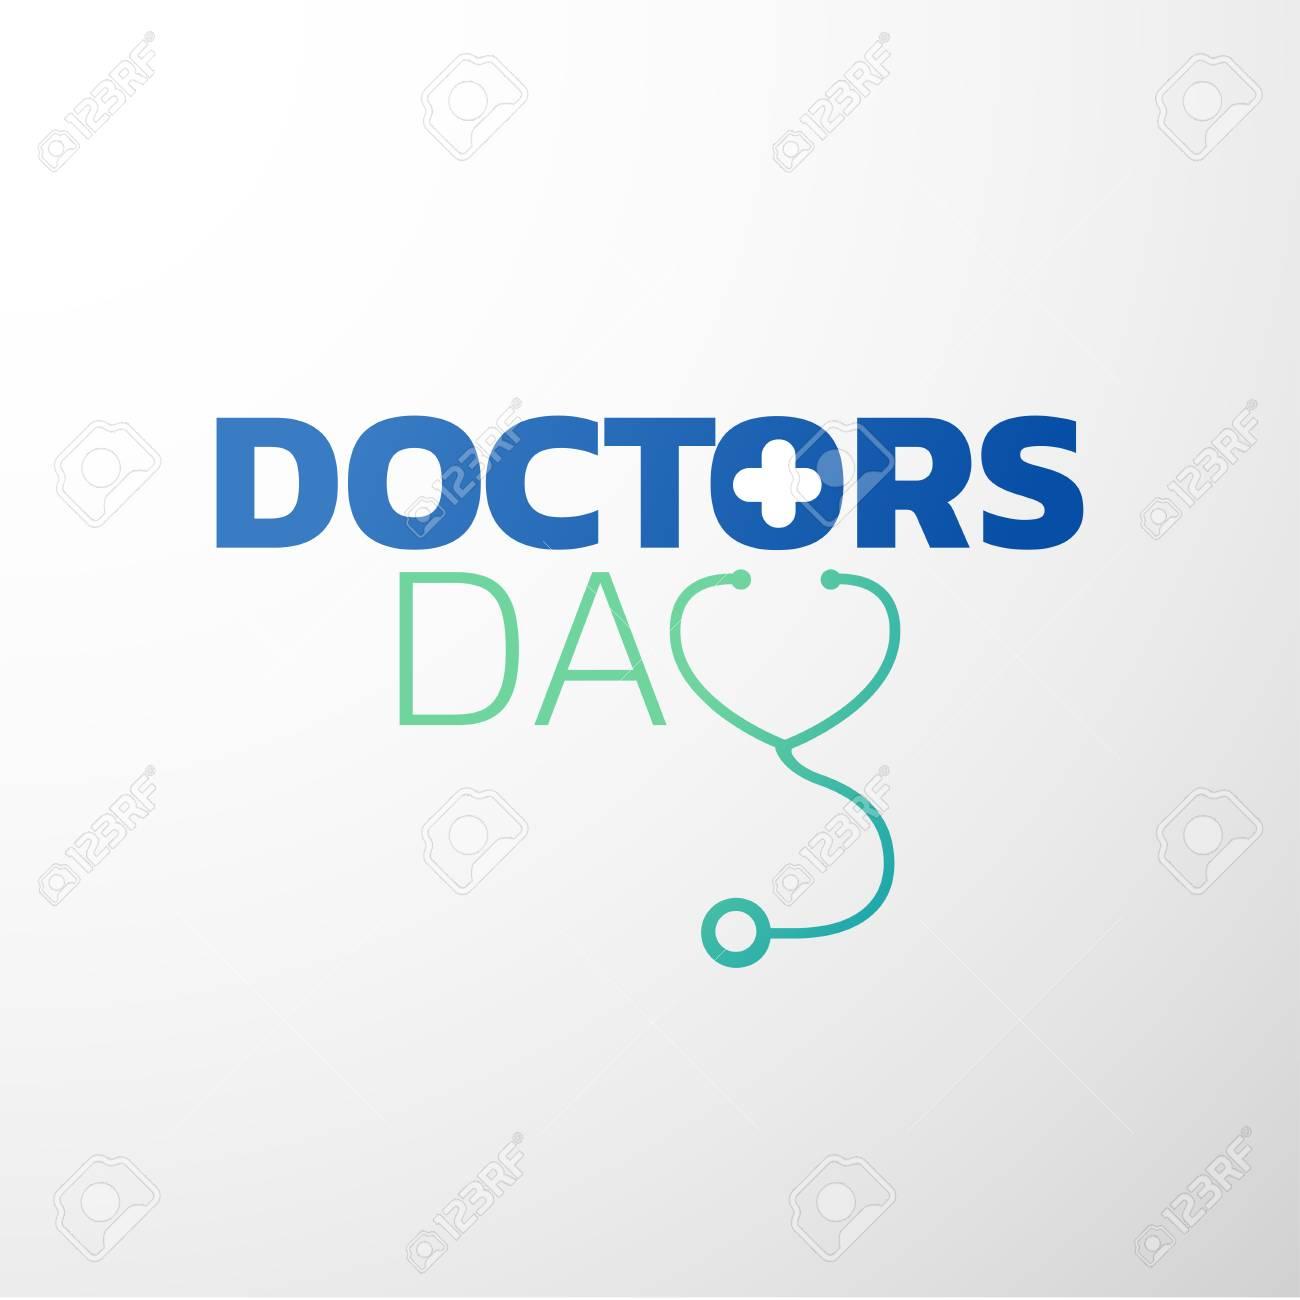 Doctors Day icon design, medical logo. Vector illustration - 96589107